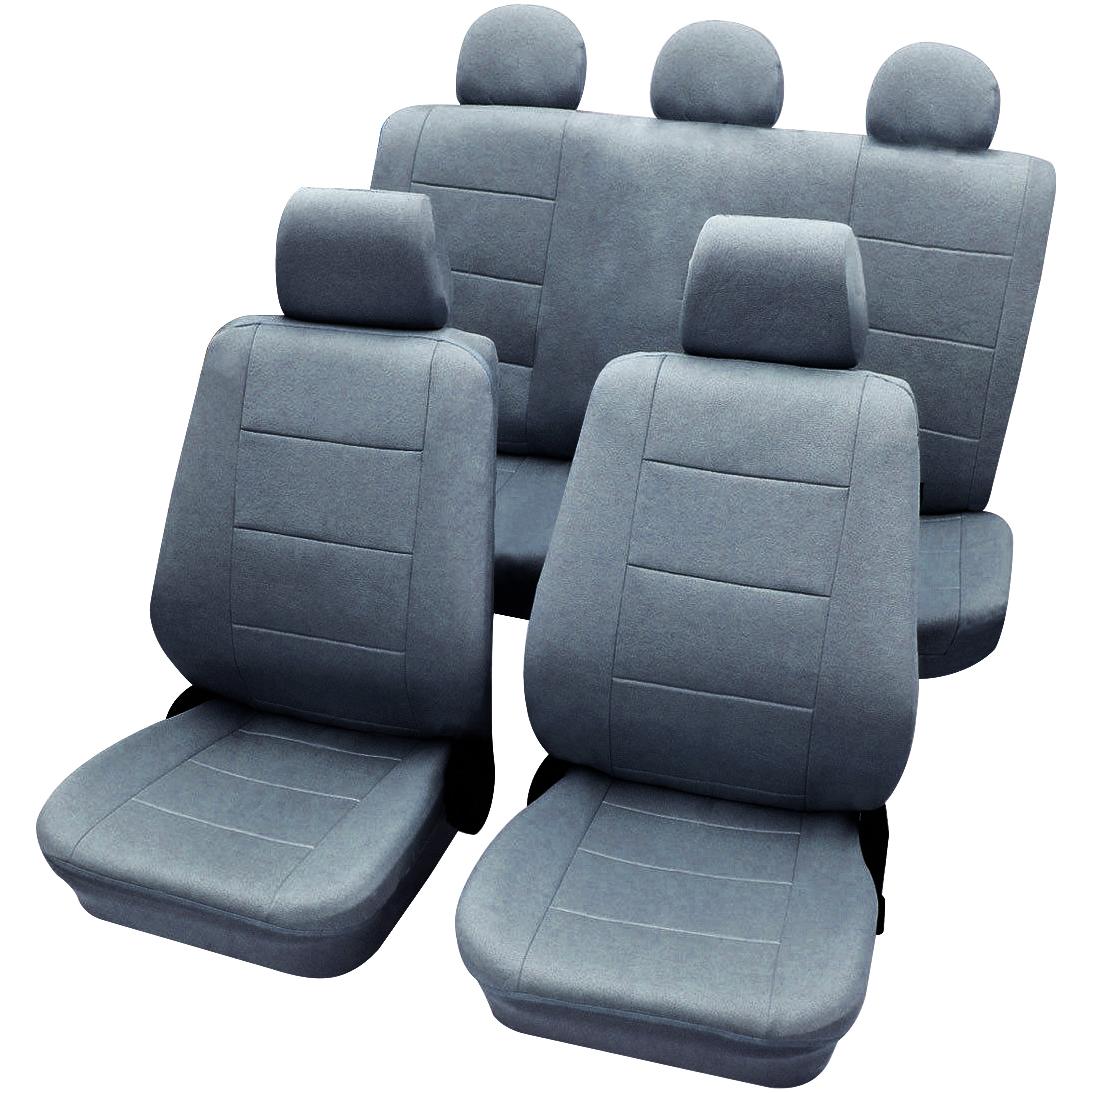 auto sitzbez ge sitzbezug schoner f r pkw ohne seitenairbag grau as7313gr ebay. Black Bedroom Furniture Sets. Home Design Ideas